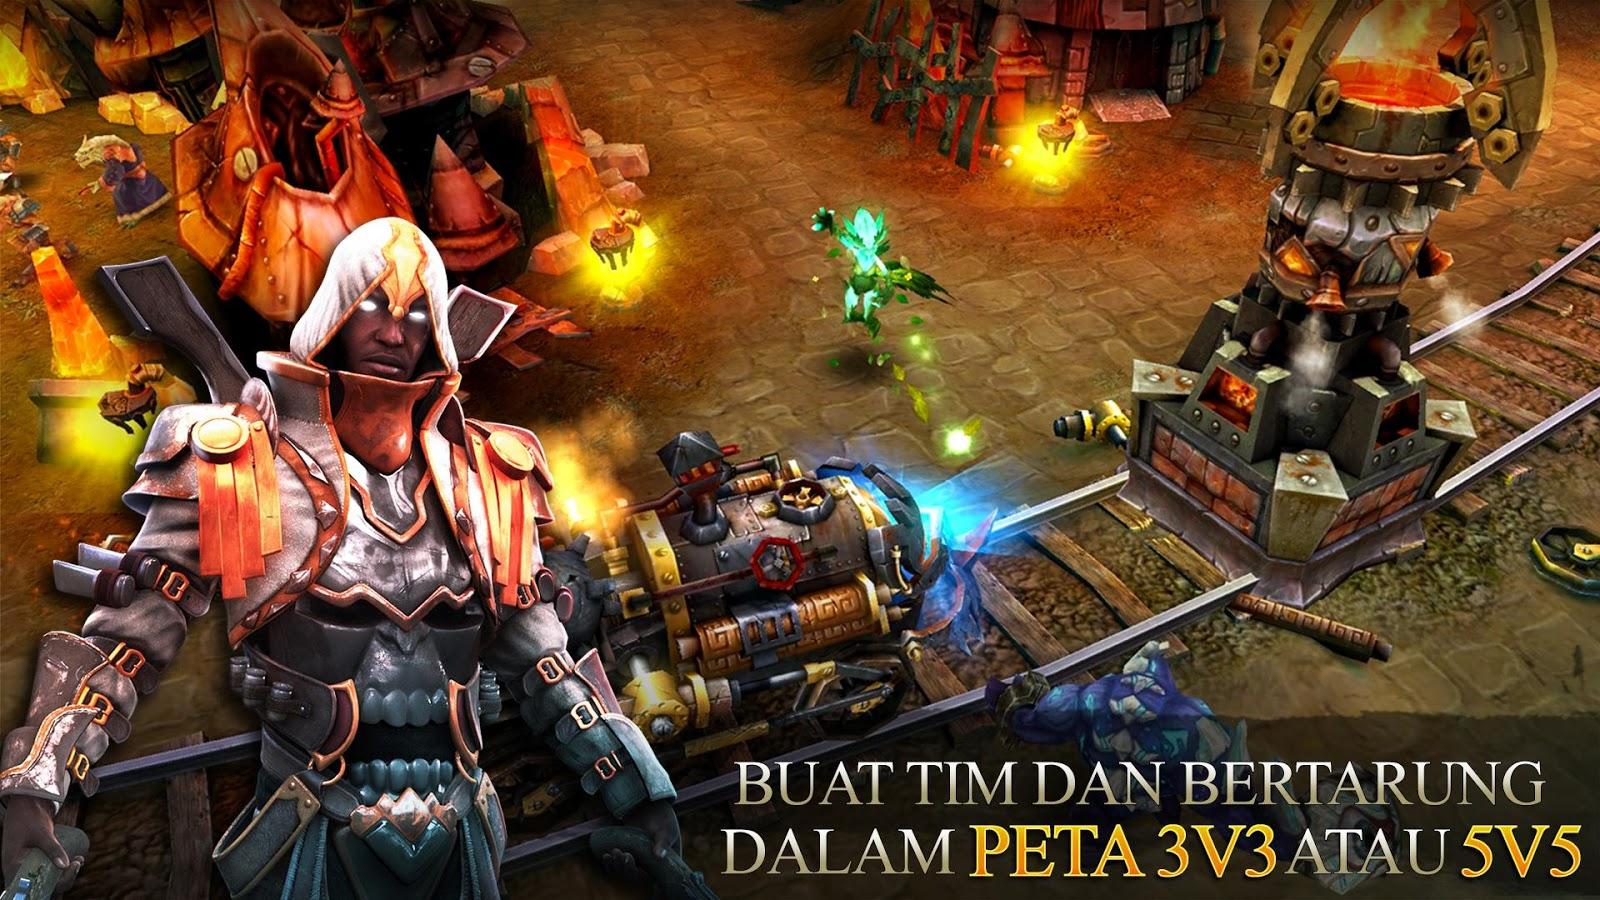 Free Download Heroes of Order & Chaos Apk Mod V2.2.0j Terbaru 2015